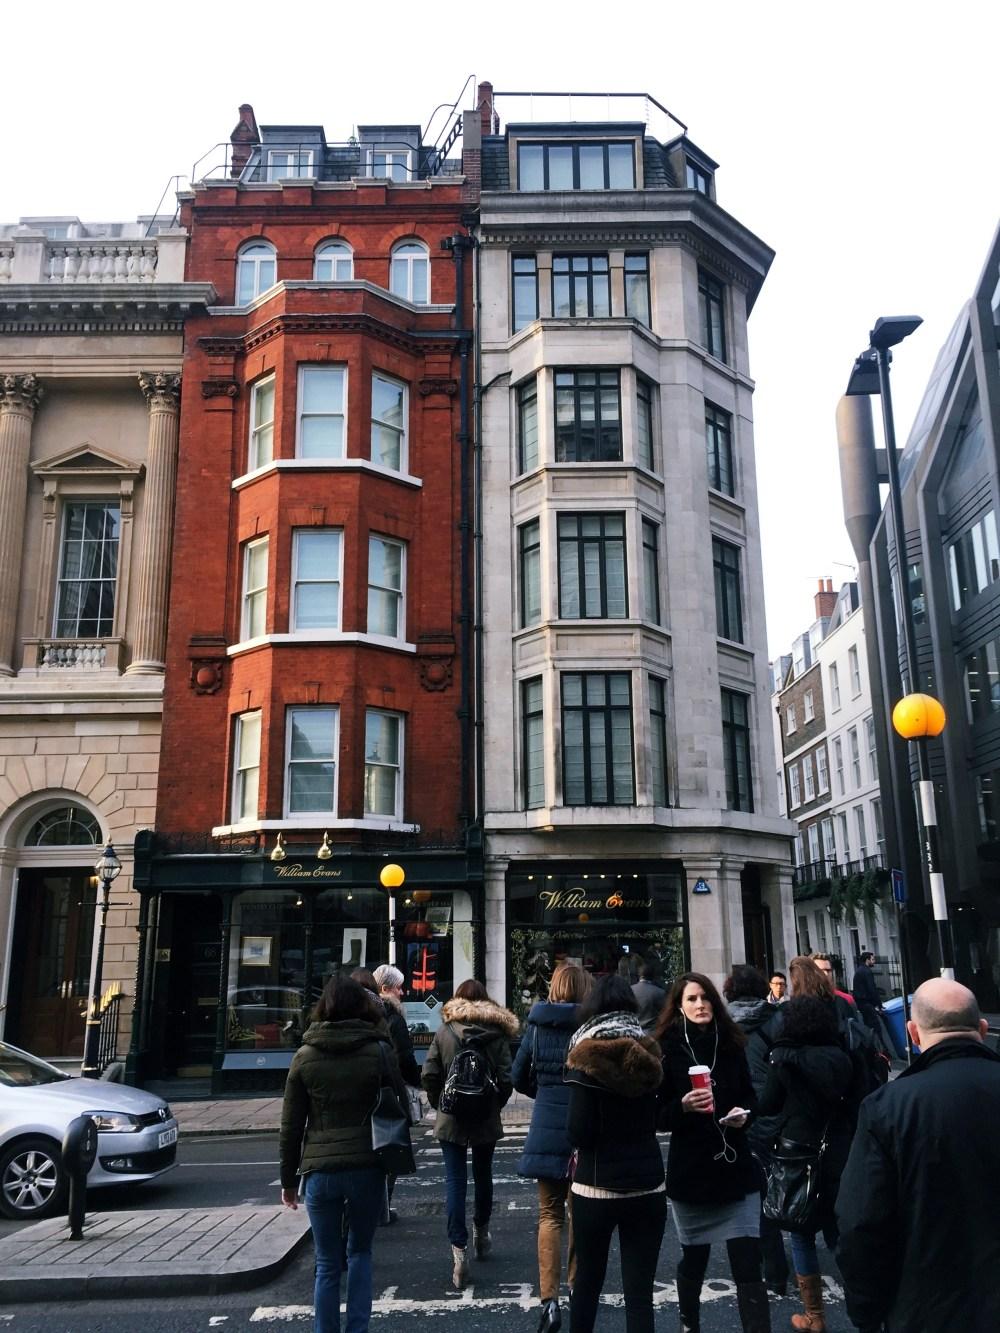 9 Dec 2016: St James's Street   London, England